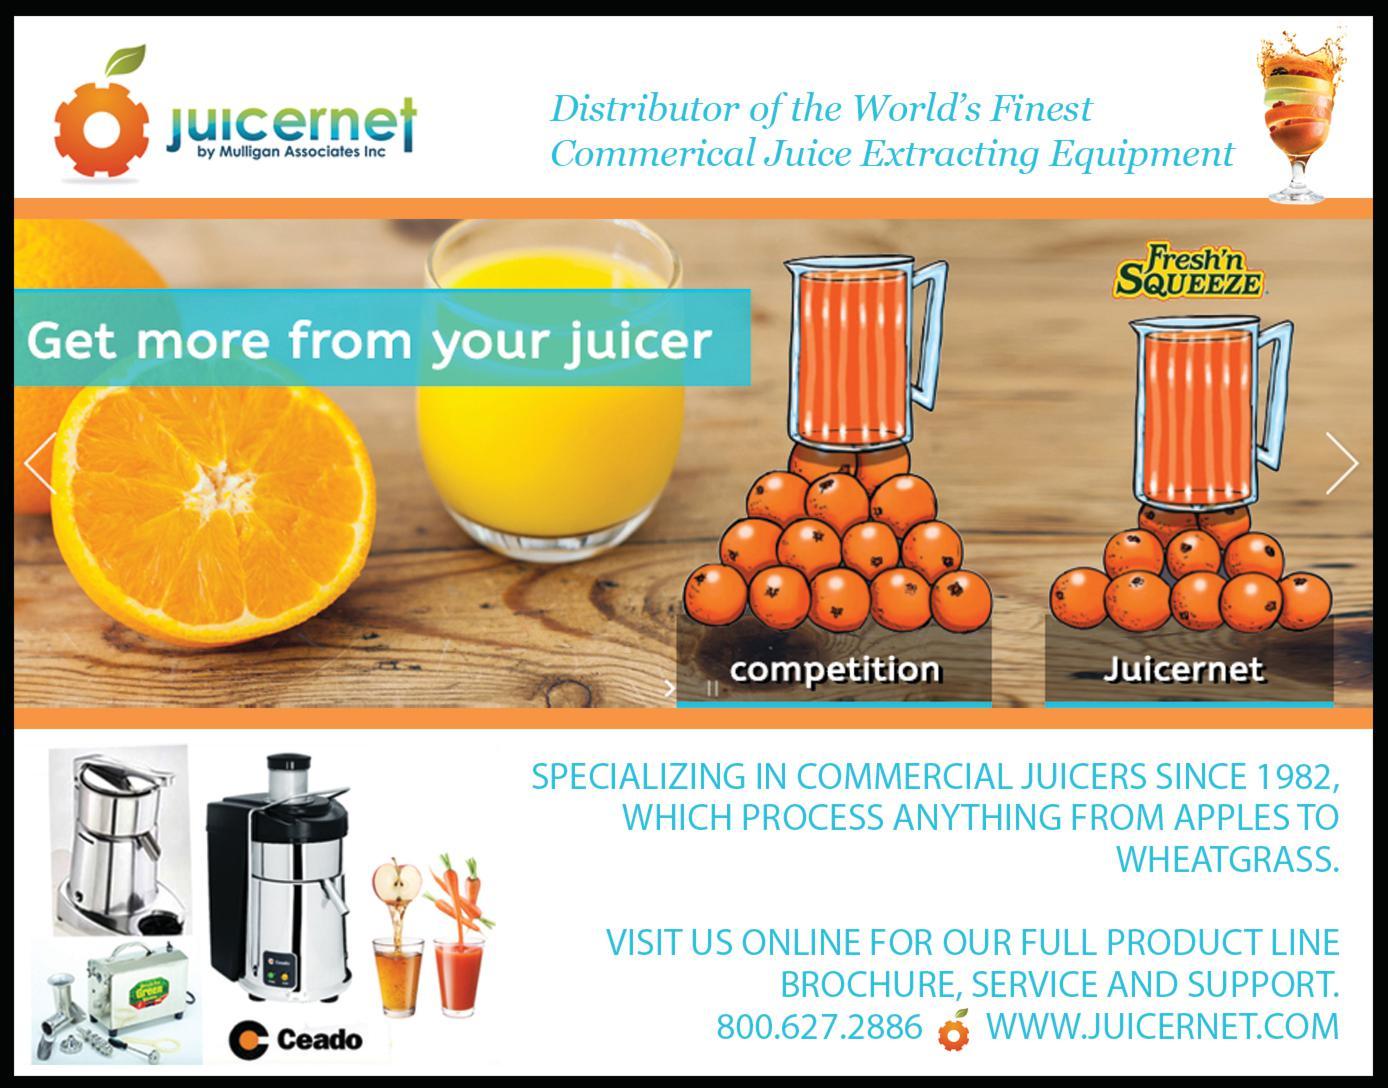 Juicernet by Mulligan Associates Inc